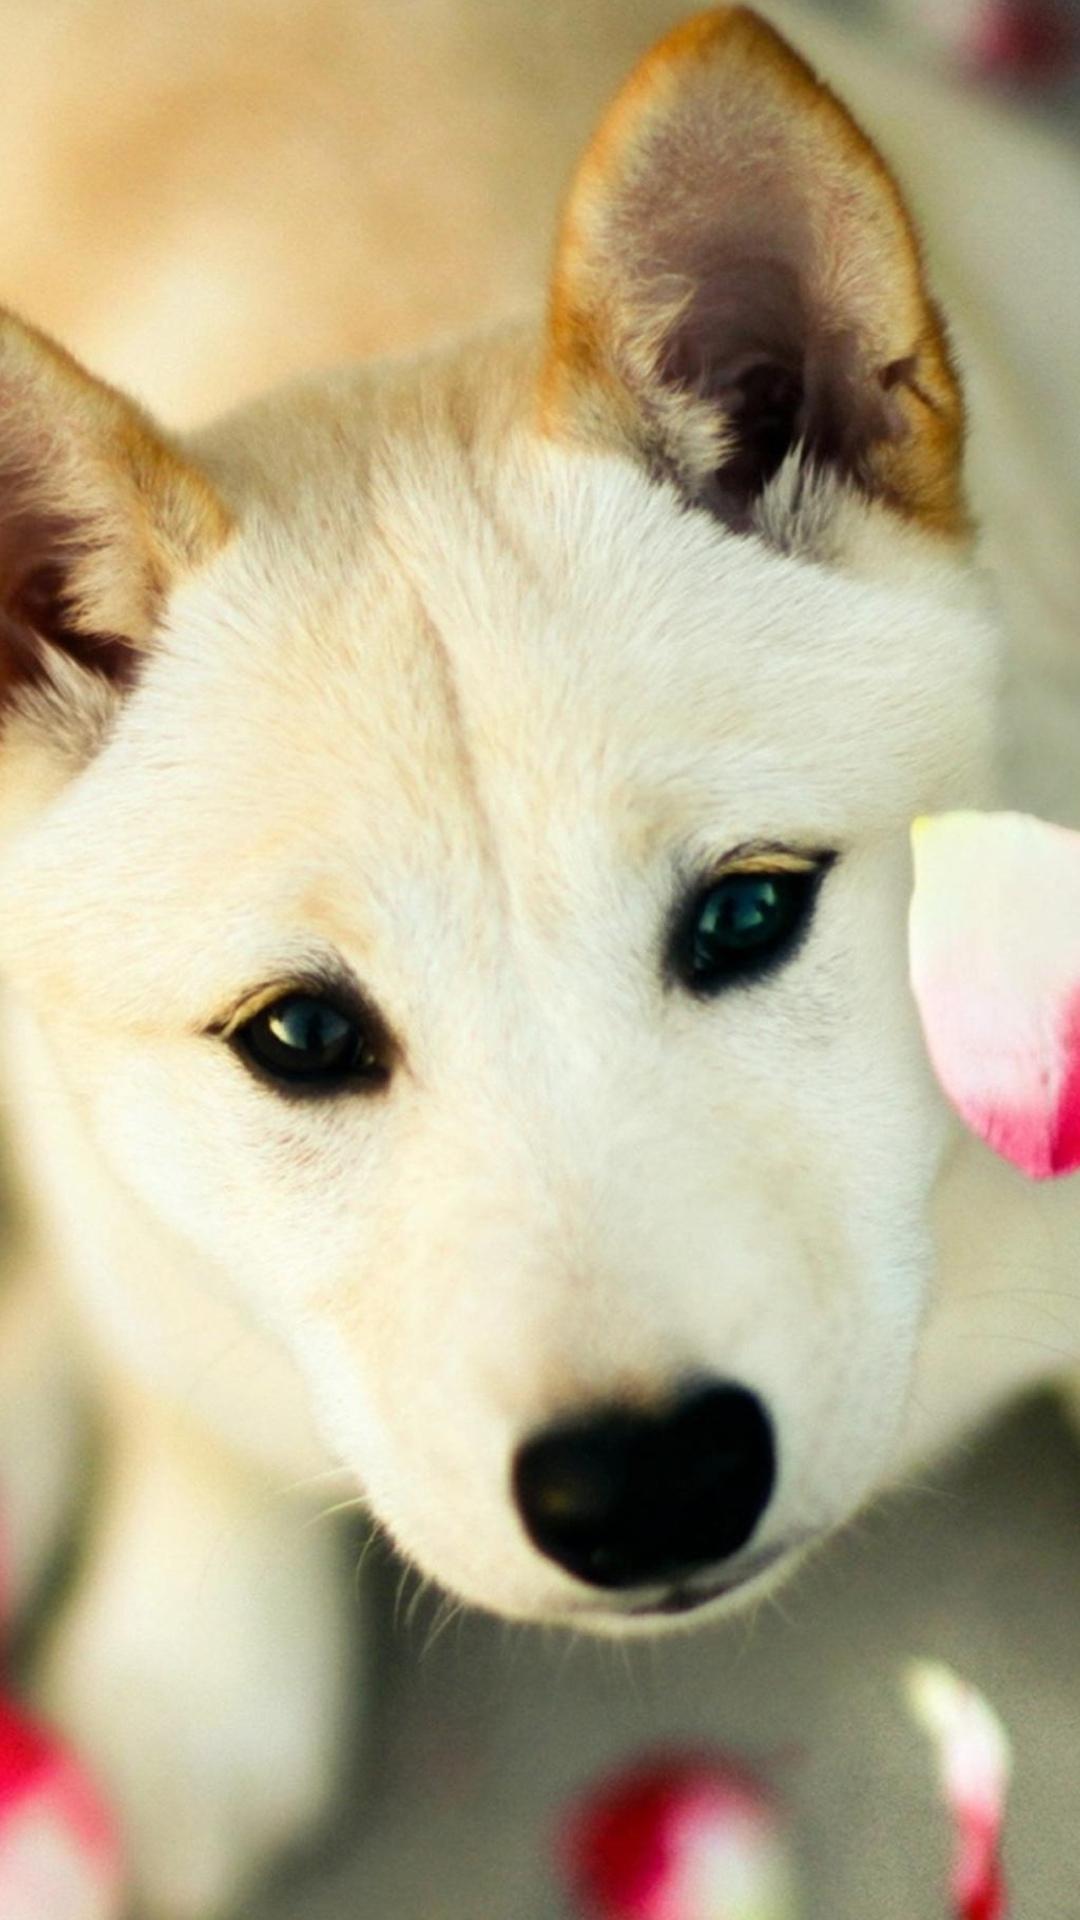 dog pink petals android wallpaper free download